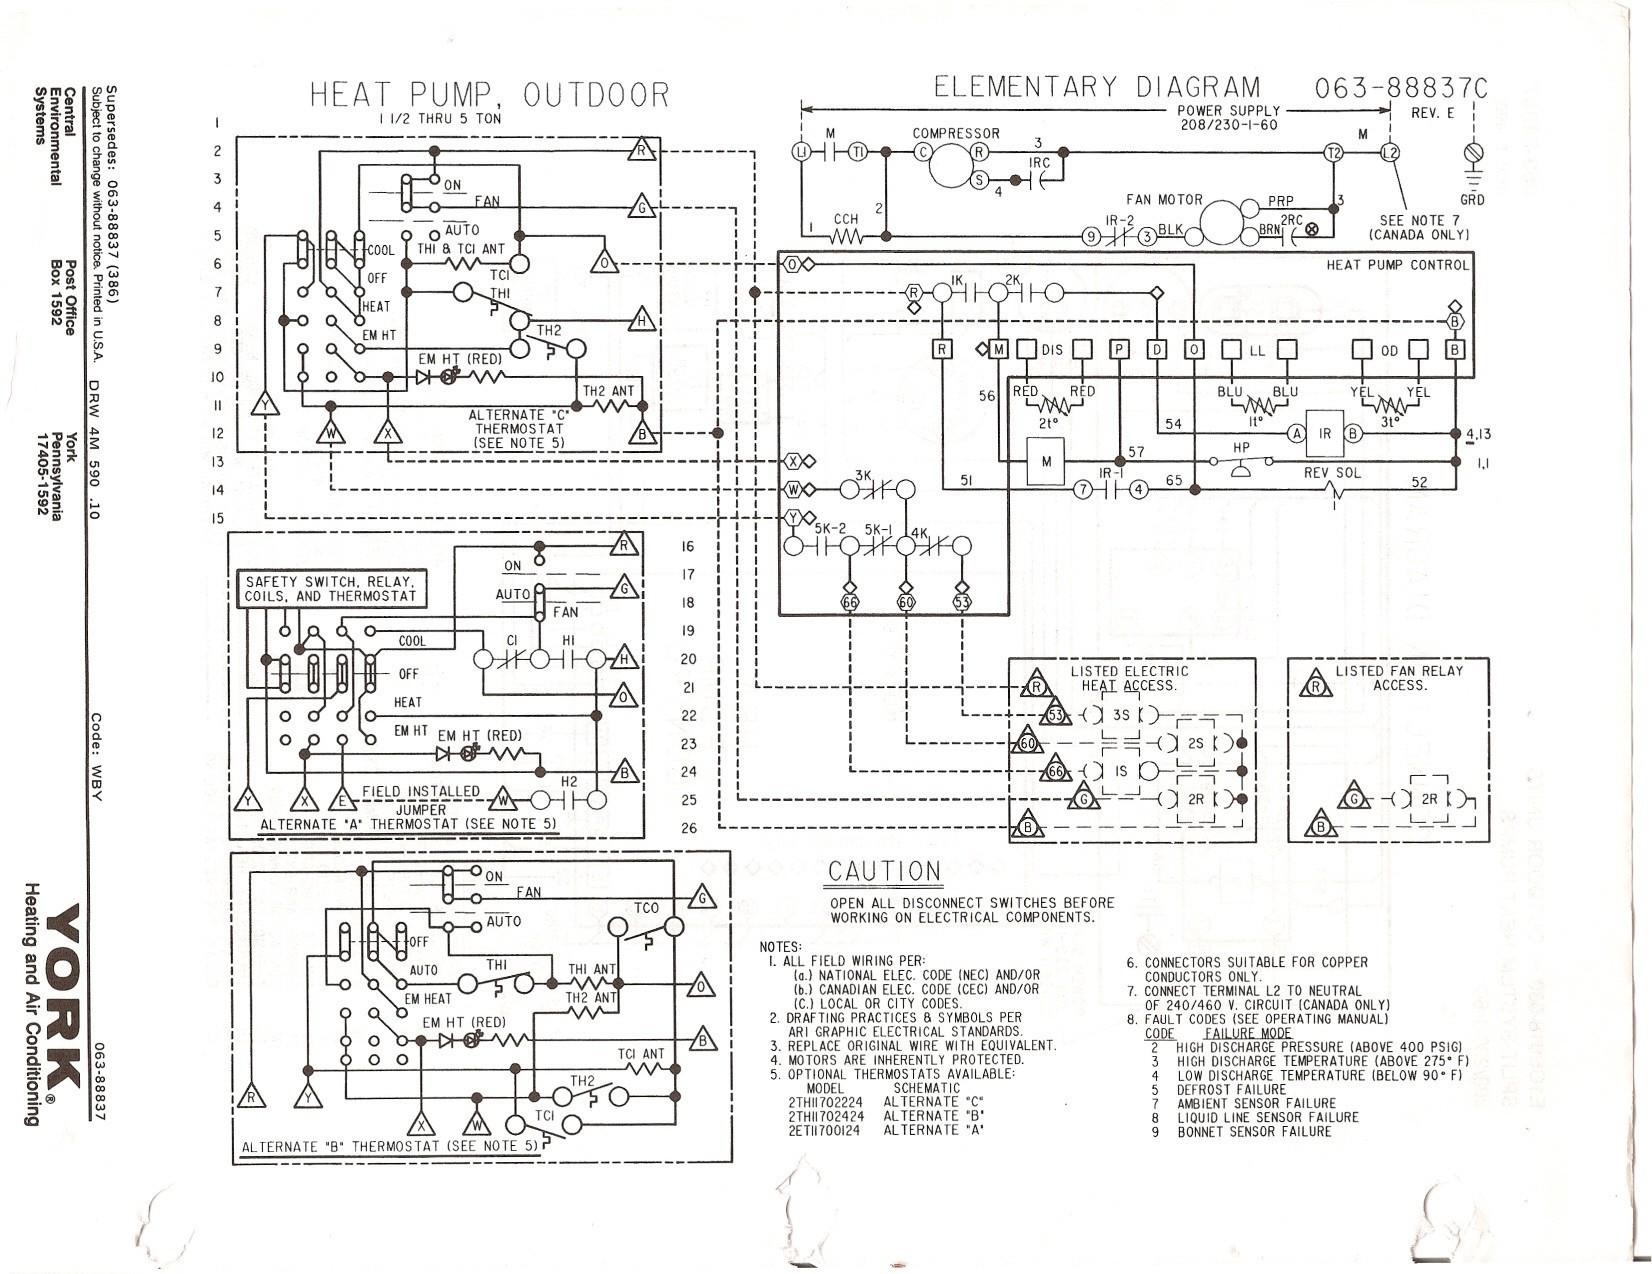 Trane Xl1400 Heat Pump